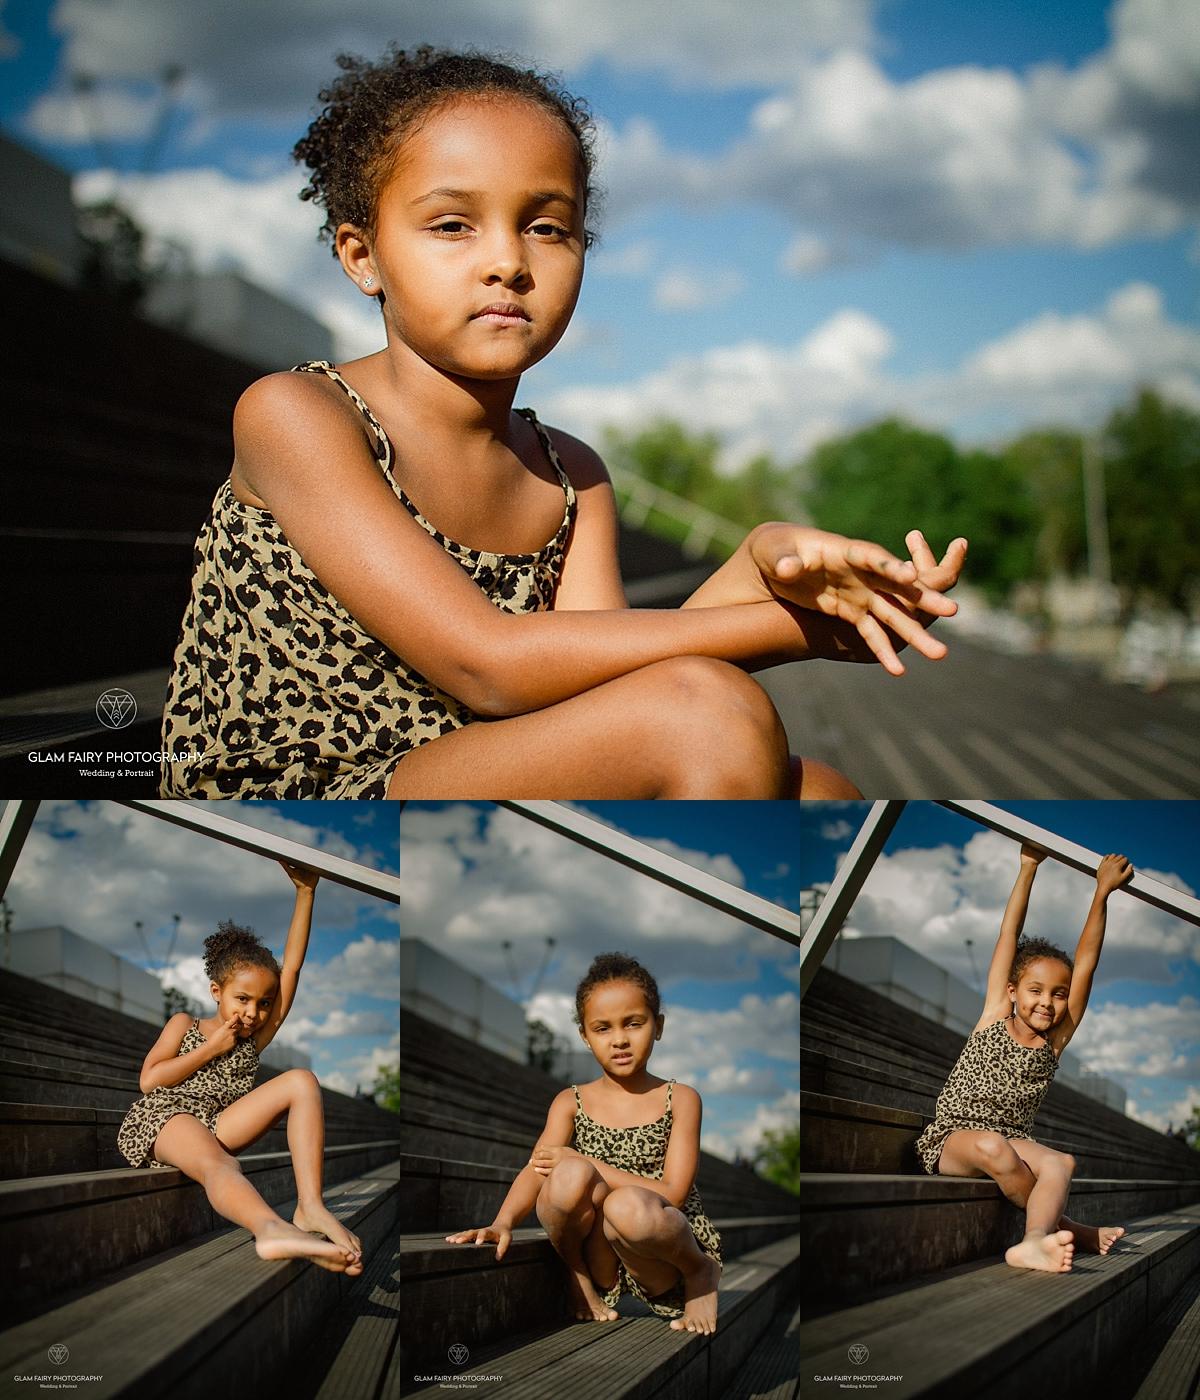 GlamFairyPhotography-séance-photo-enfant-bnf-yaelle_0010